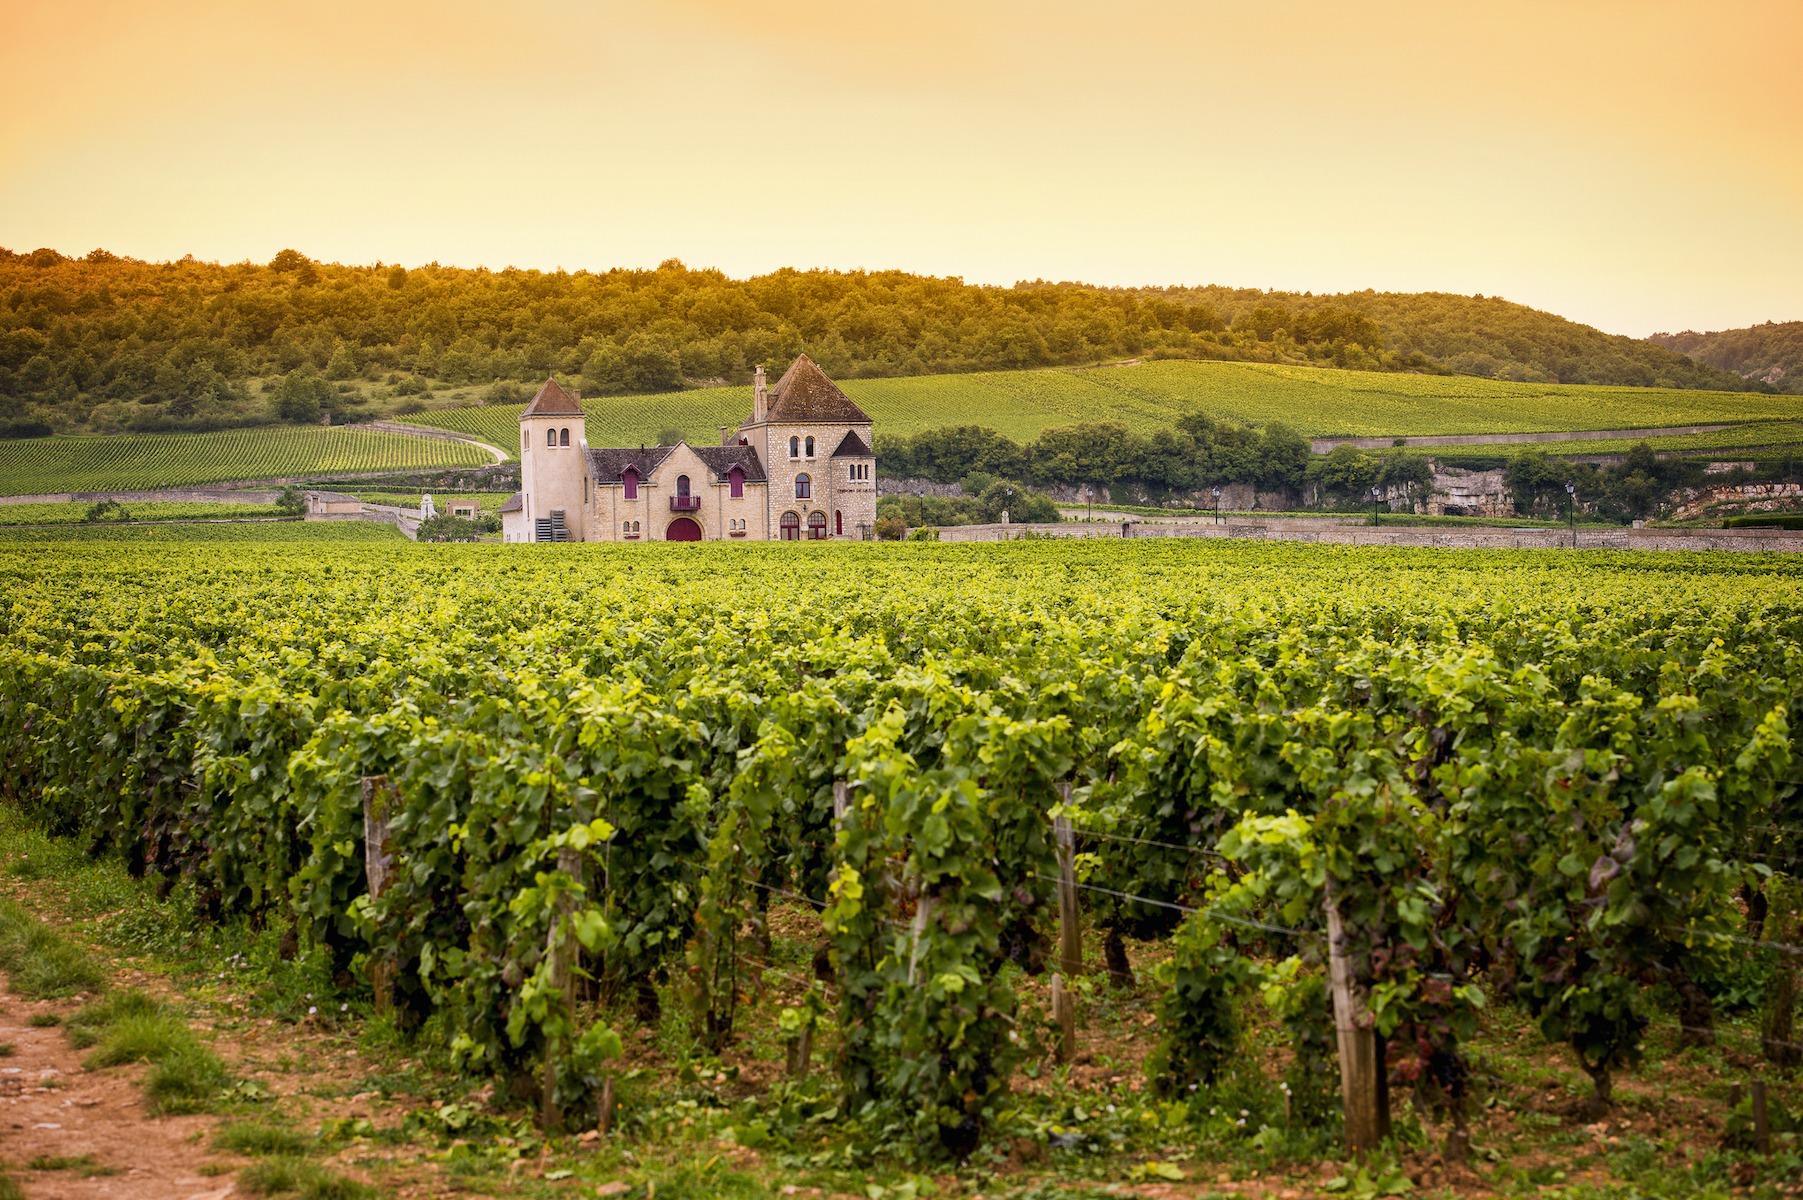 burgundy wine trails in fall